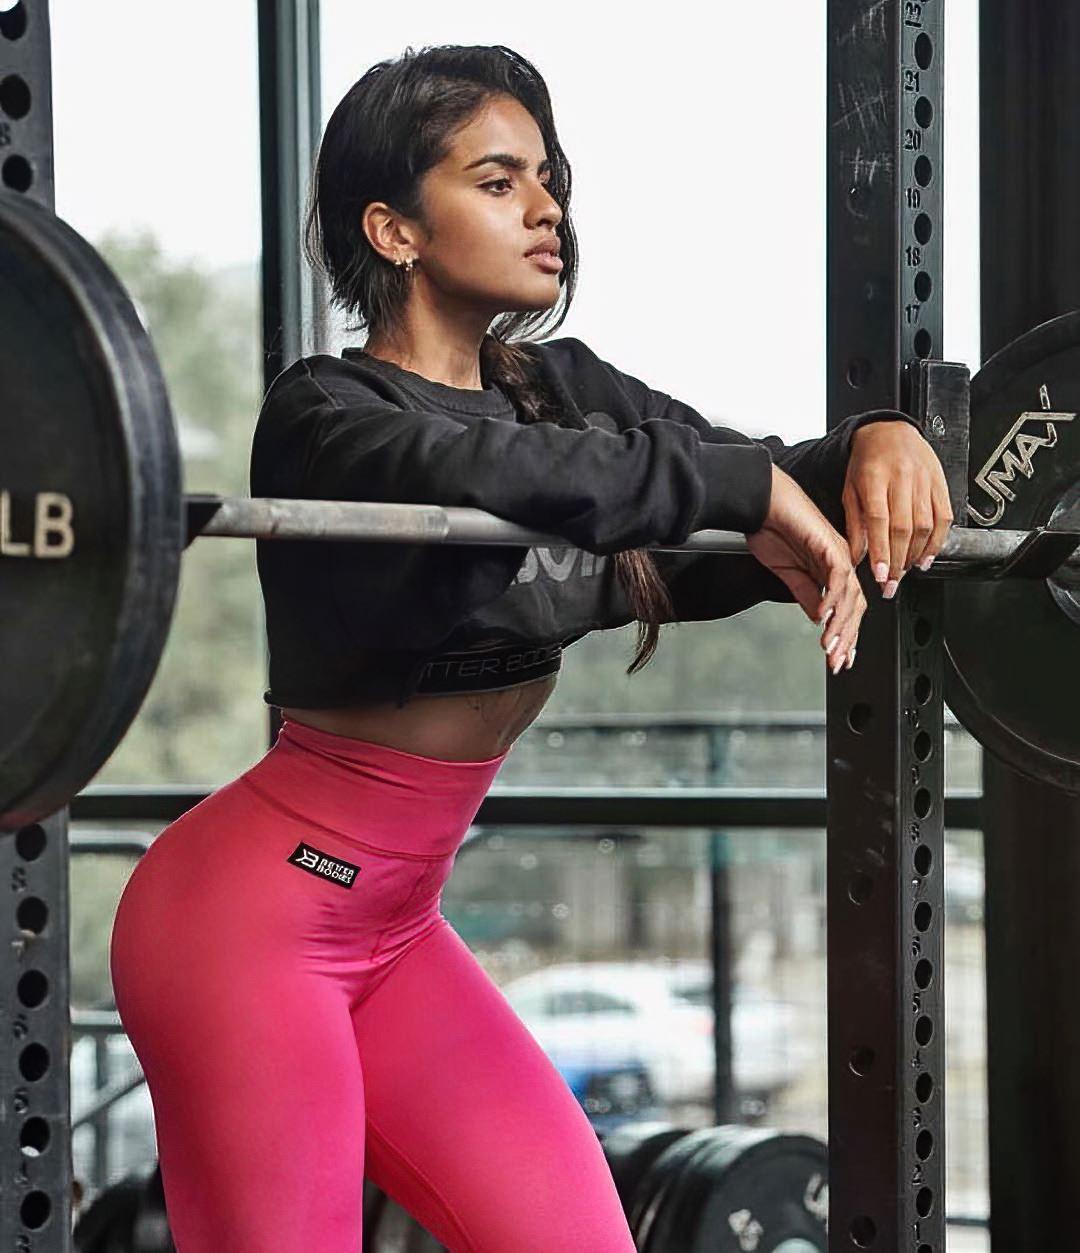 Fitness Female Models - Pricilla Aquila